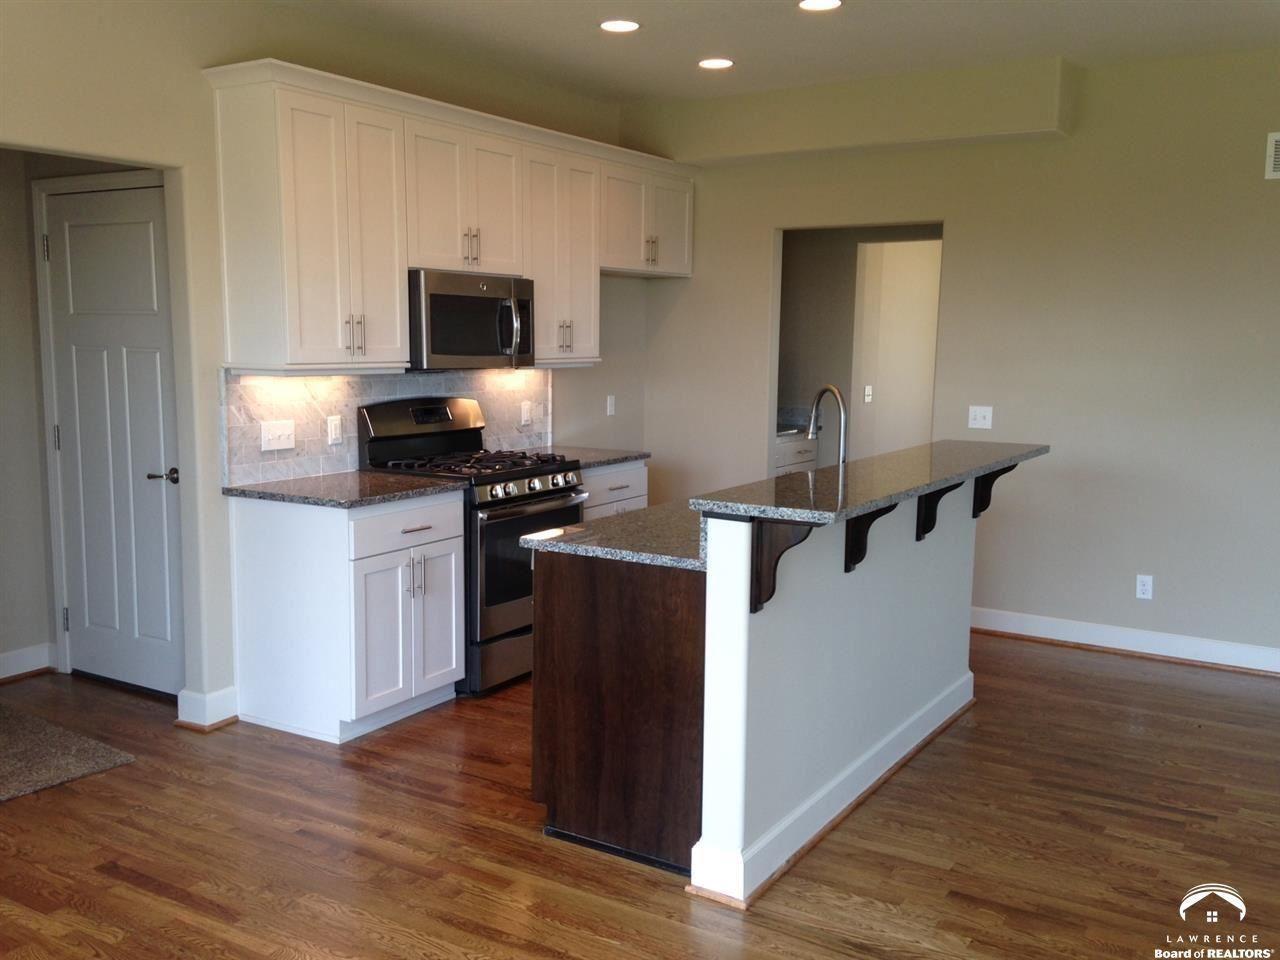 galley kitchen Home and family, Galley kitchen, Kitchen